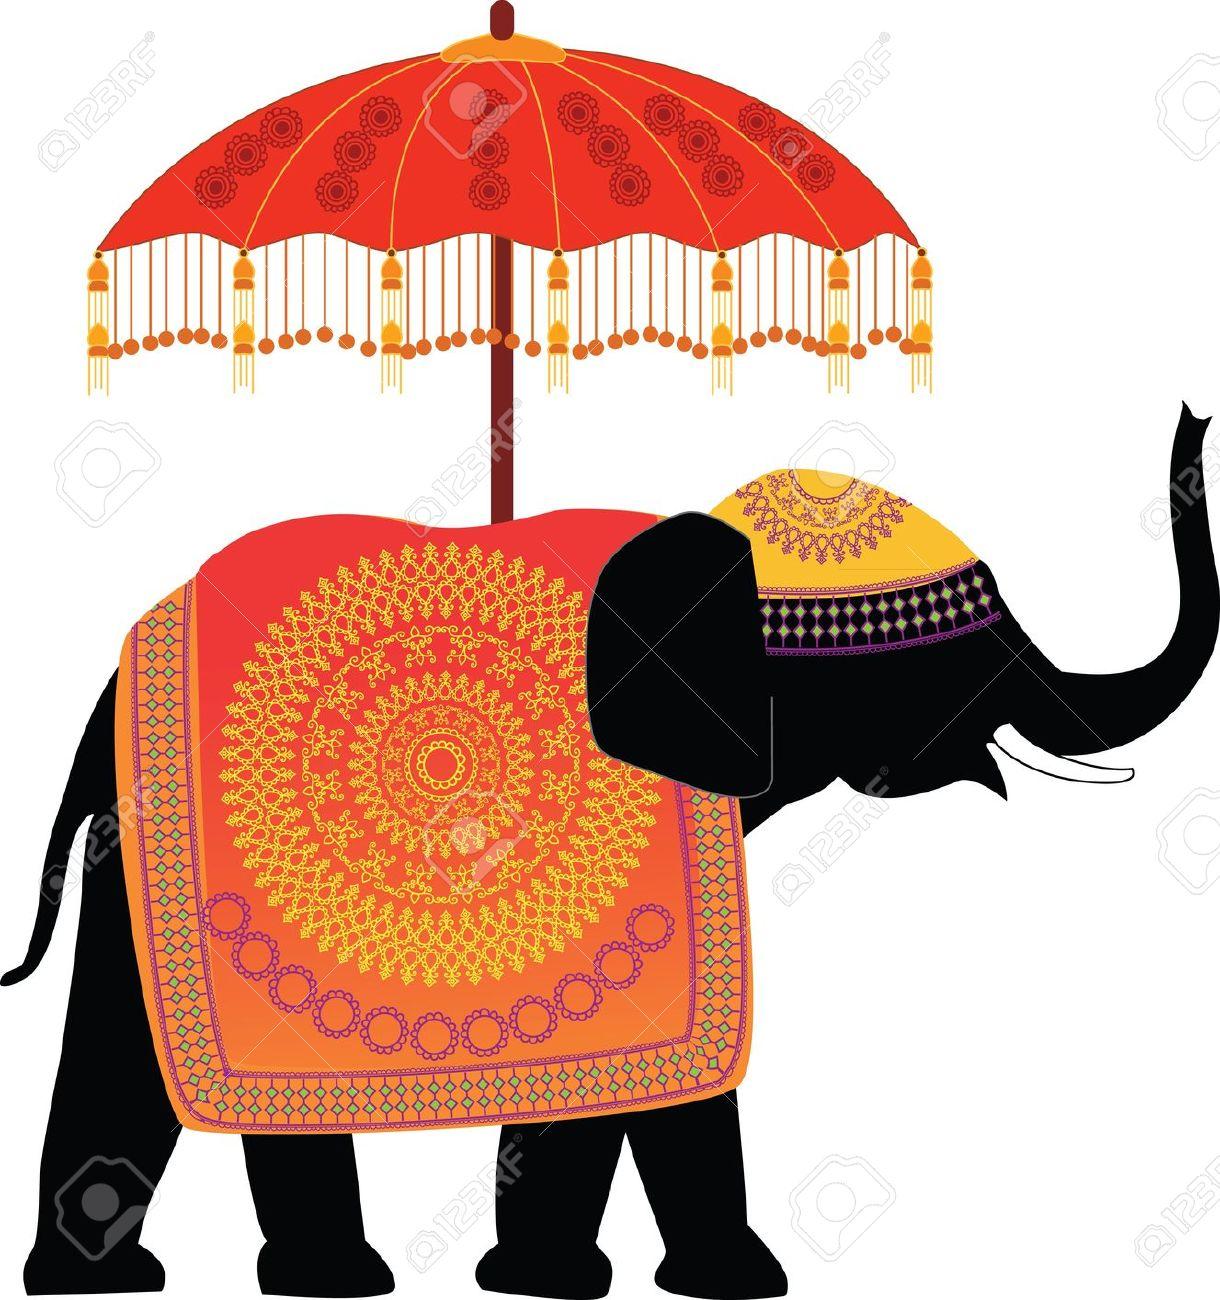 Hindu elephant clipart.